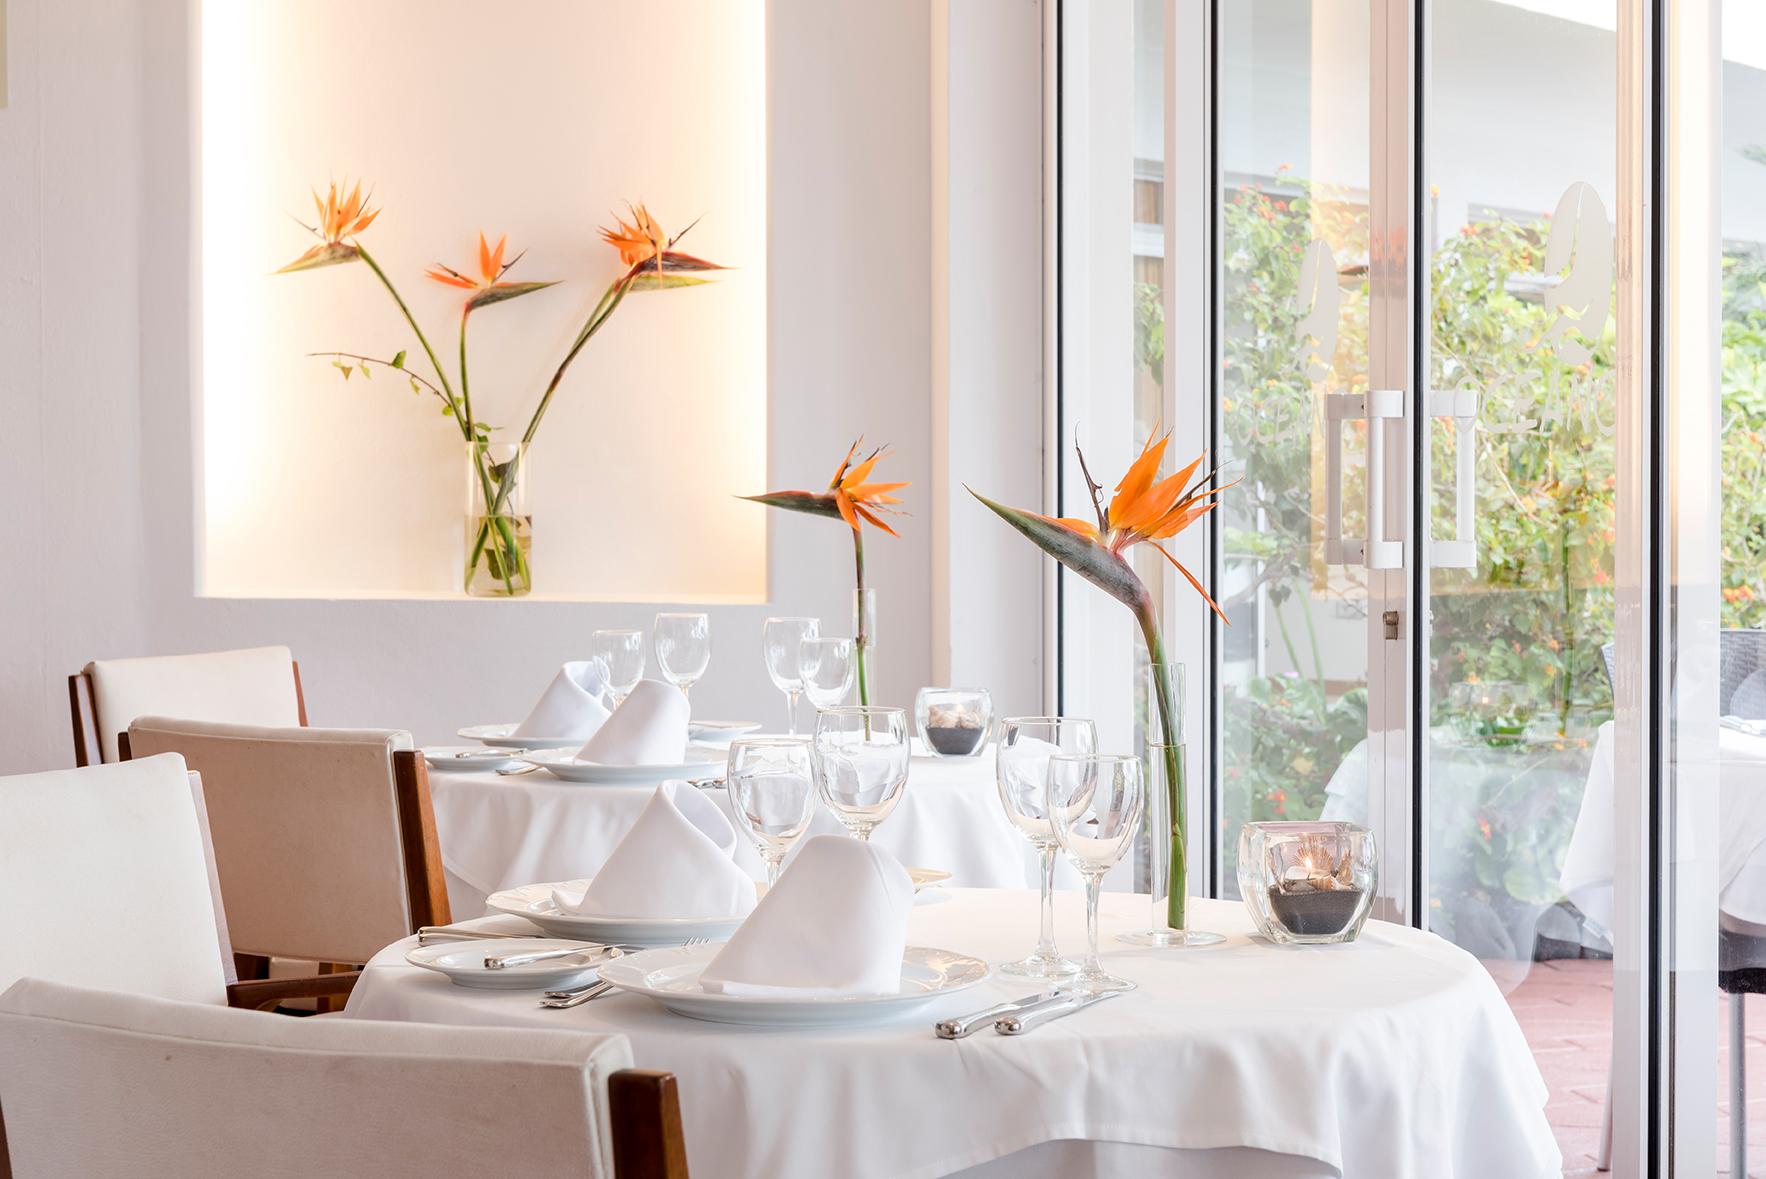 Home hanna raissle for Design hotel oberbayern